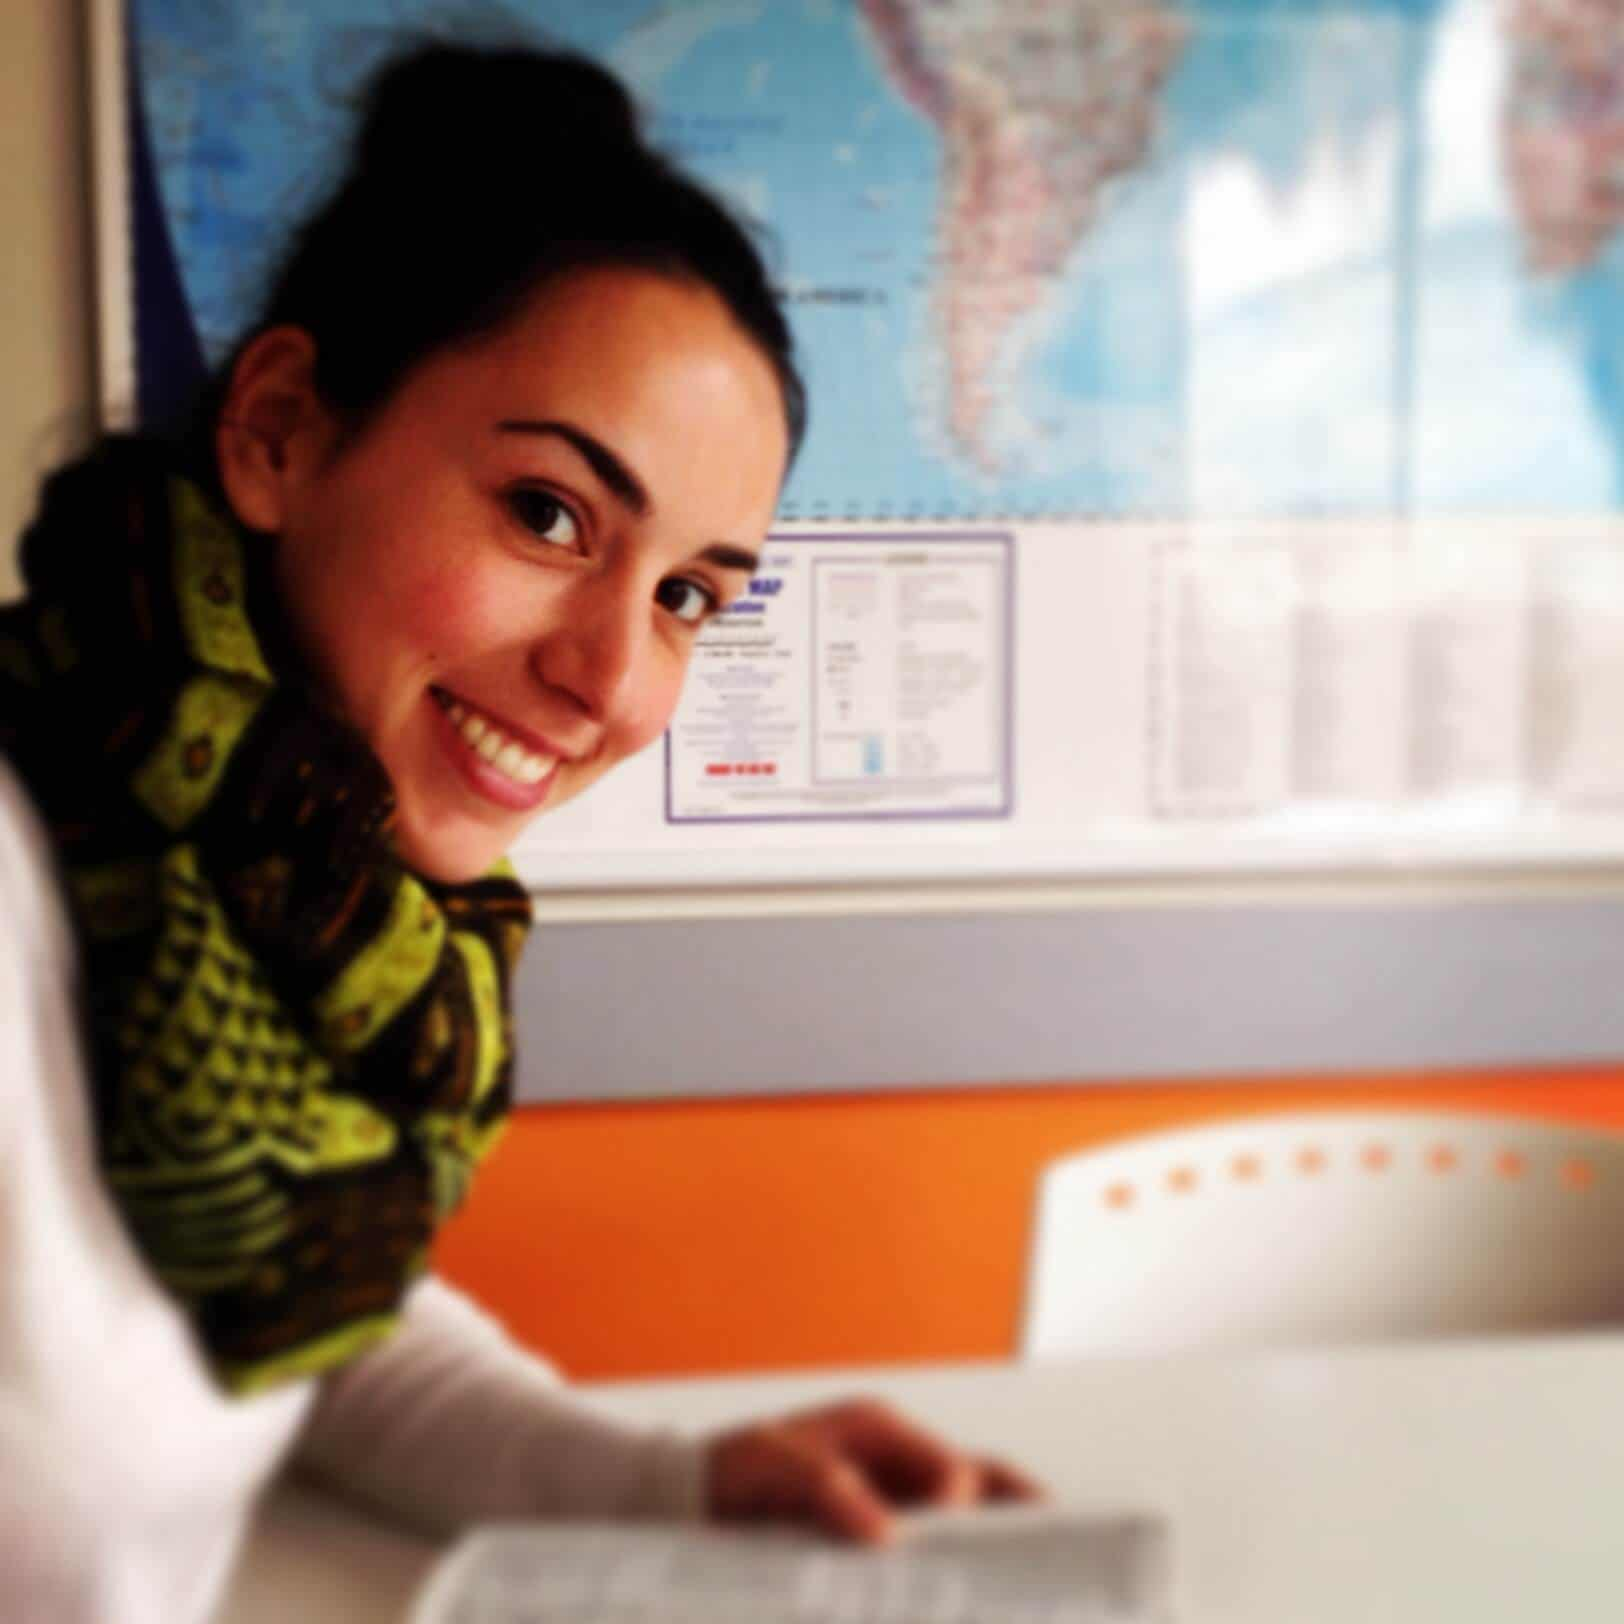 Nadine from Germany